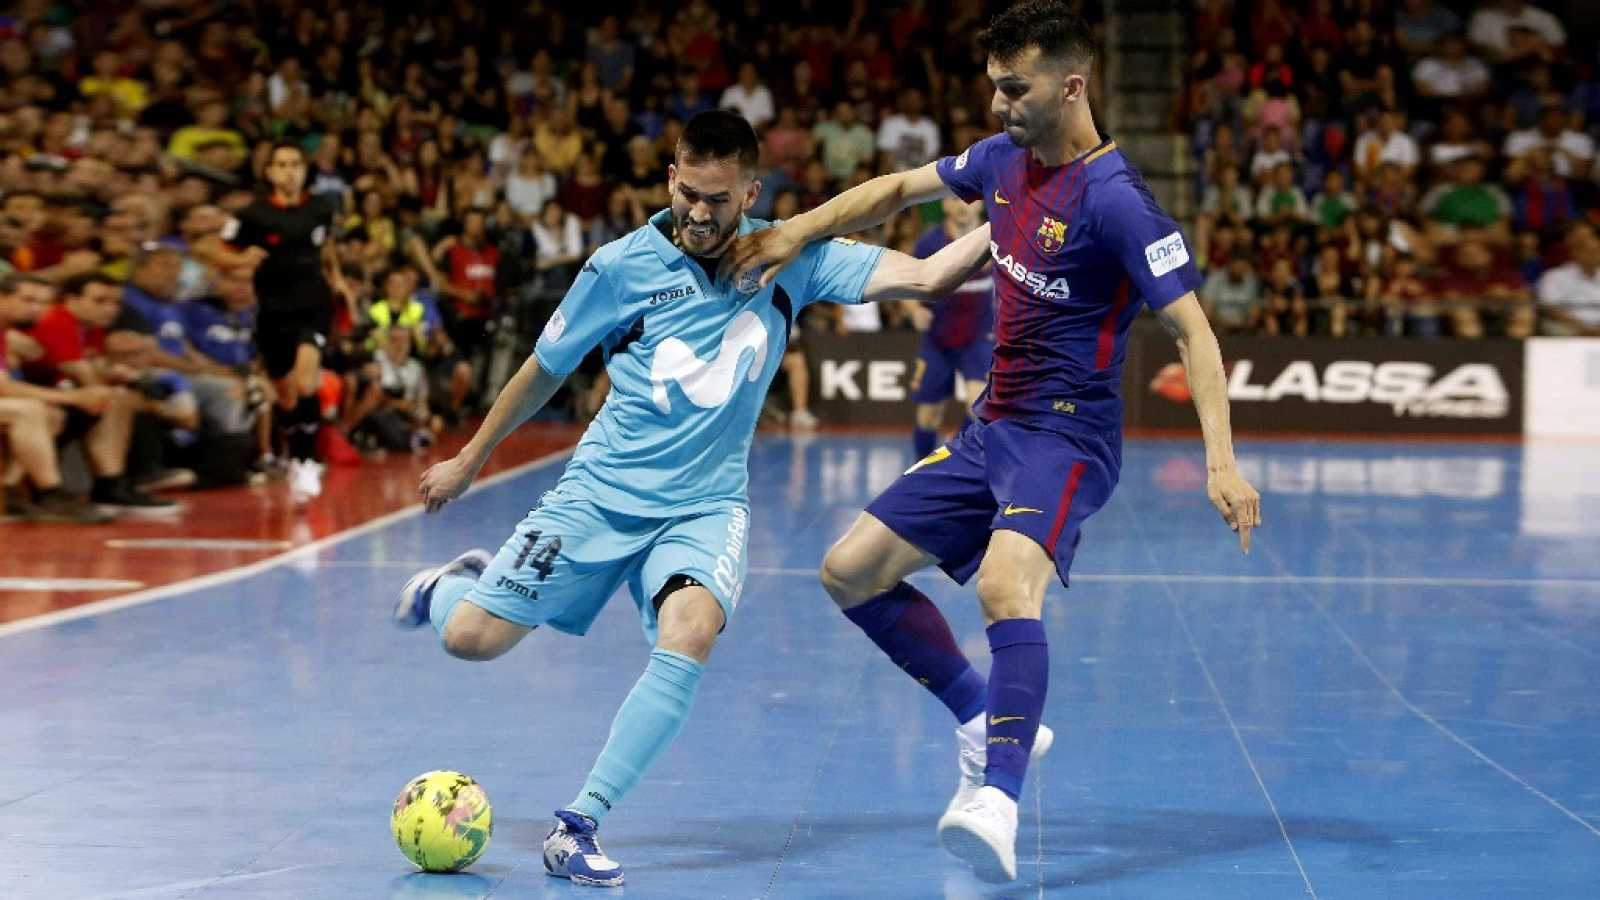 3940d2faa3784 Para todos los públicos Fútbol Sala - Liga Nacional Playoff. Final. 4º  partido  FC Barcelona Lassa - reproducir video